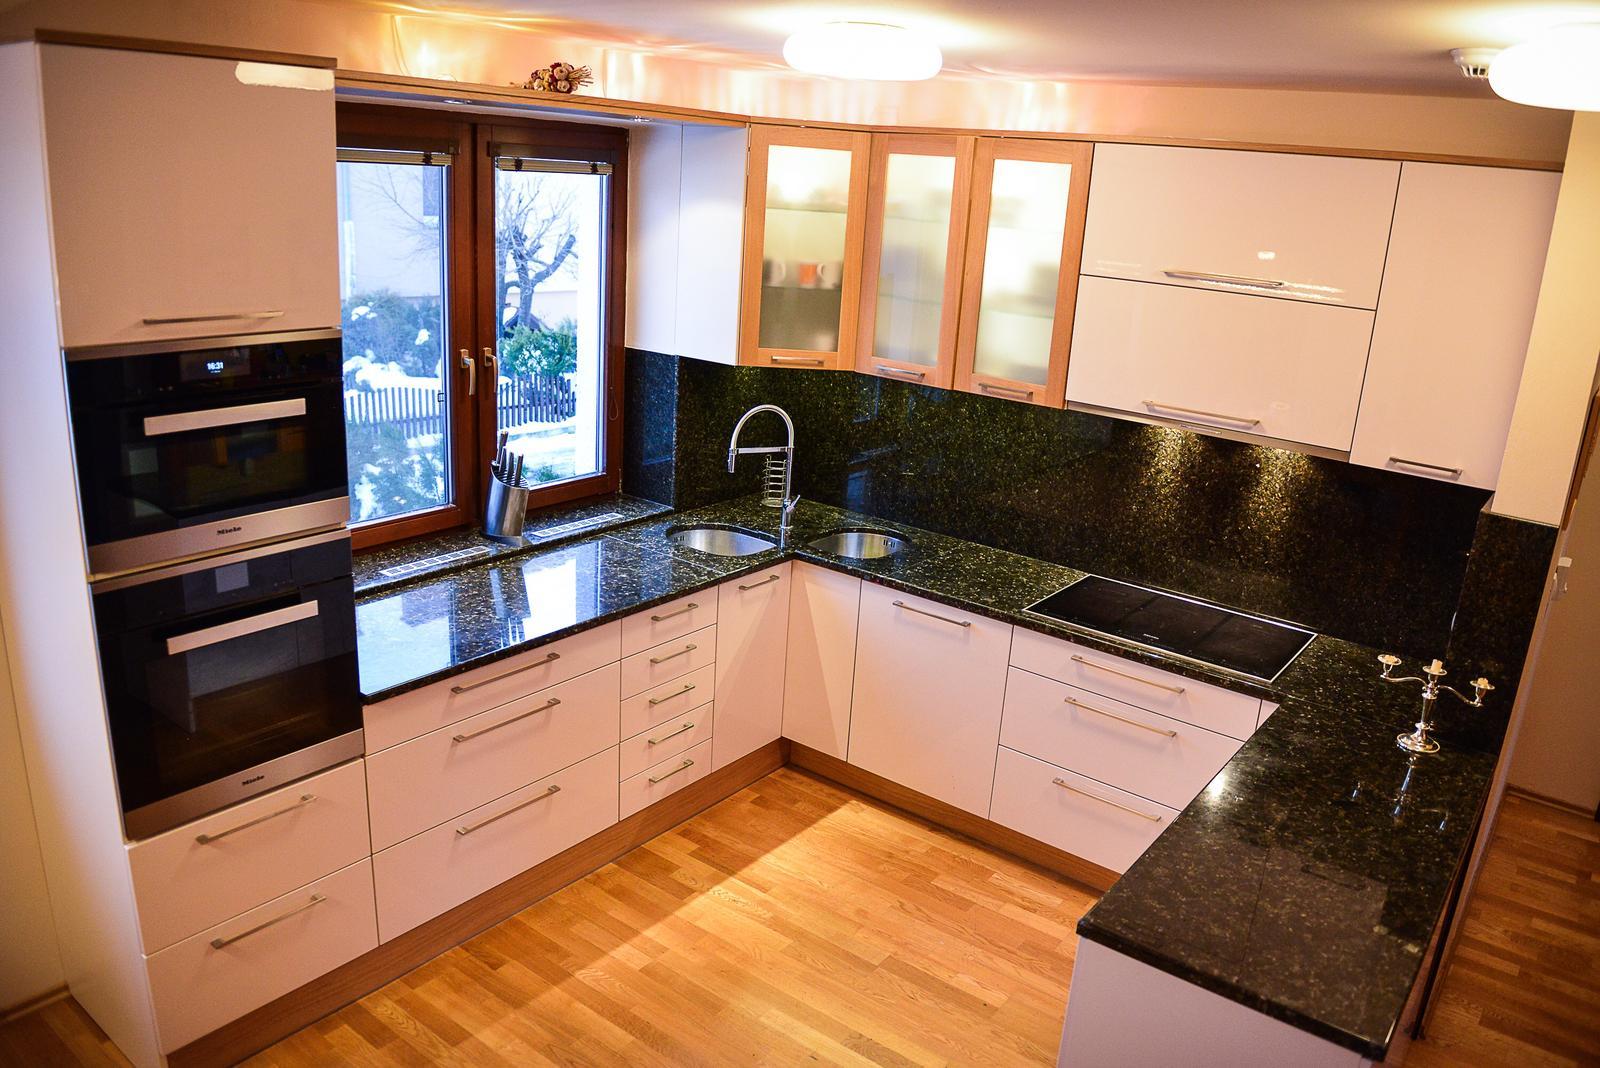 Moja krásna kuchyňa - Obrázok č. 1